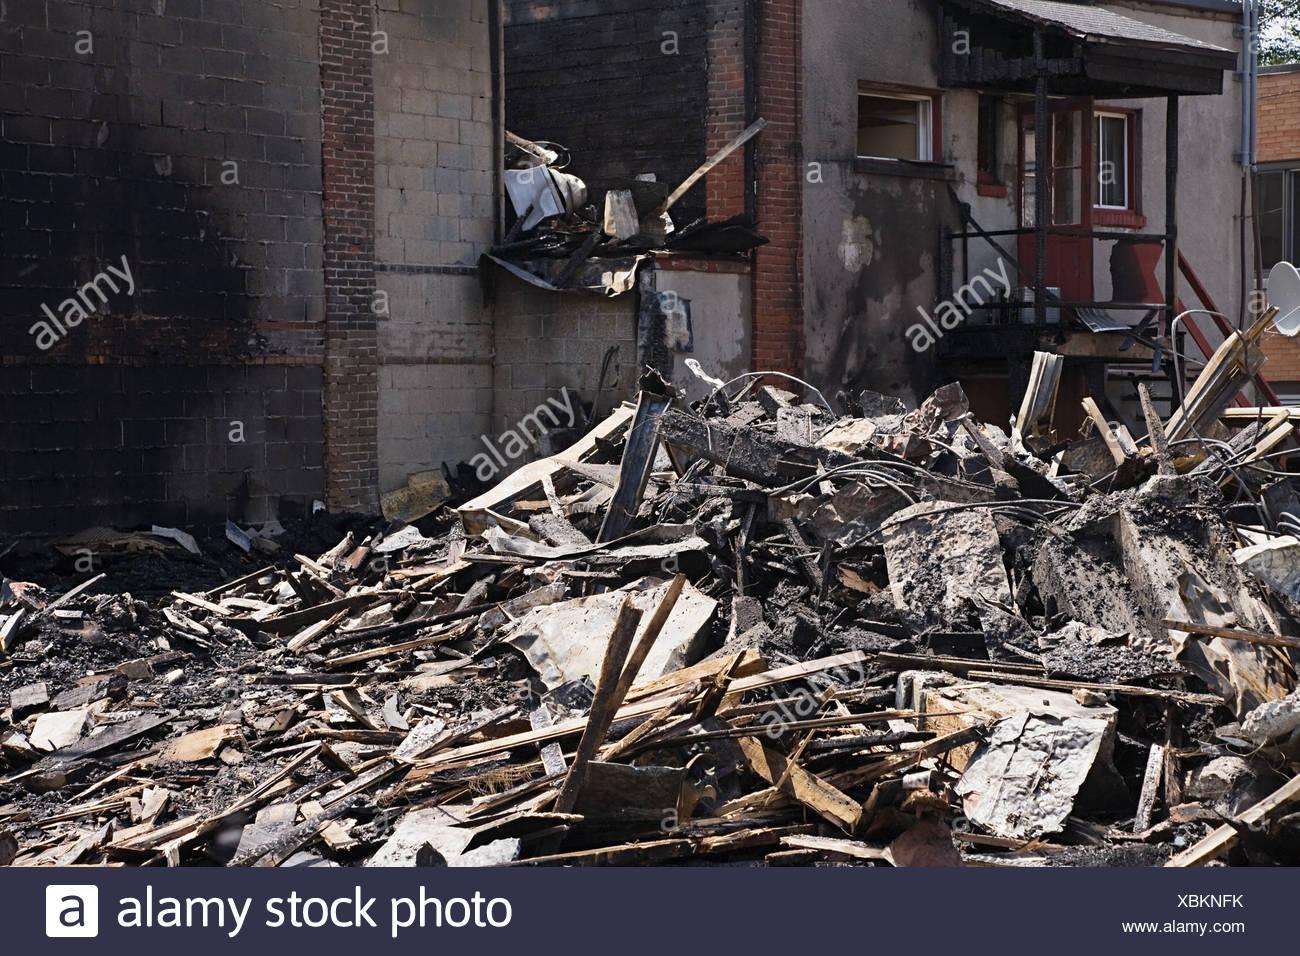 Burnt down house - Stock Image